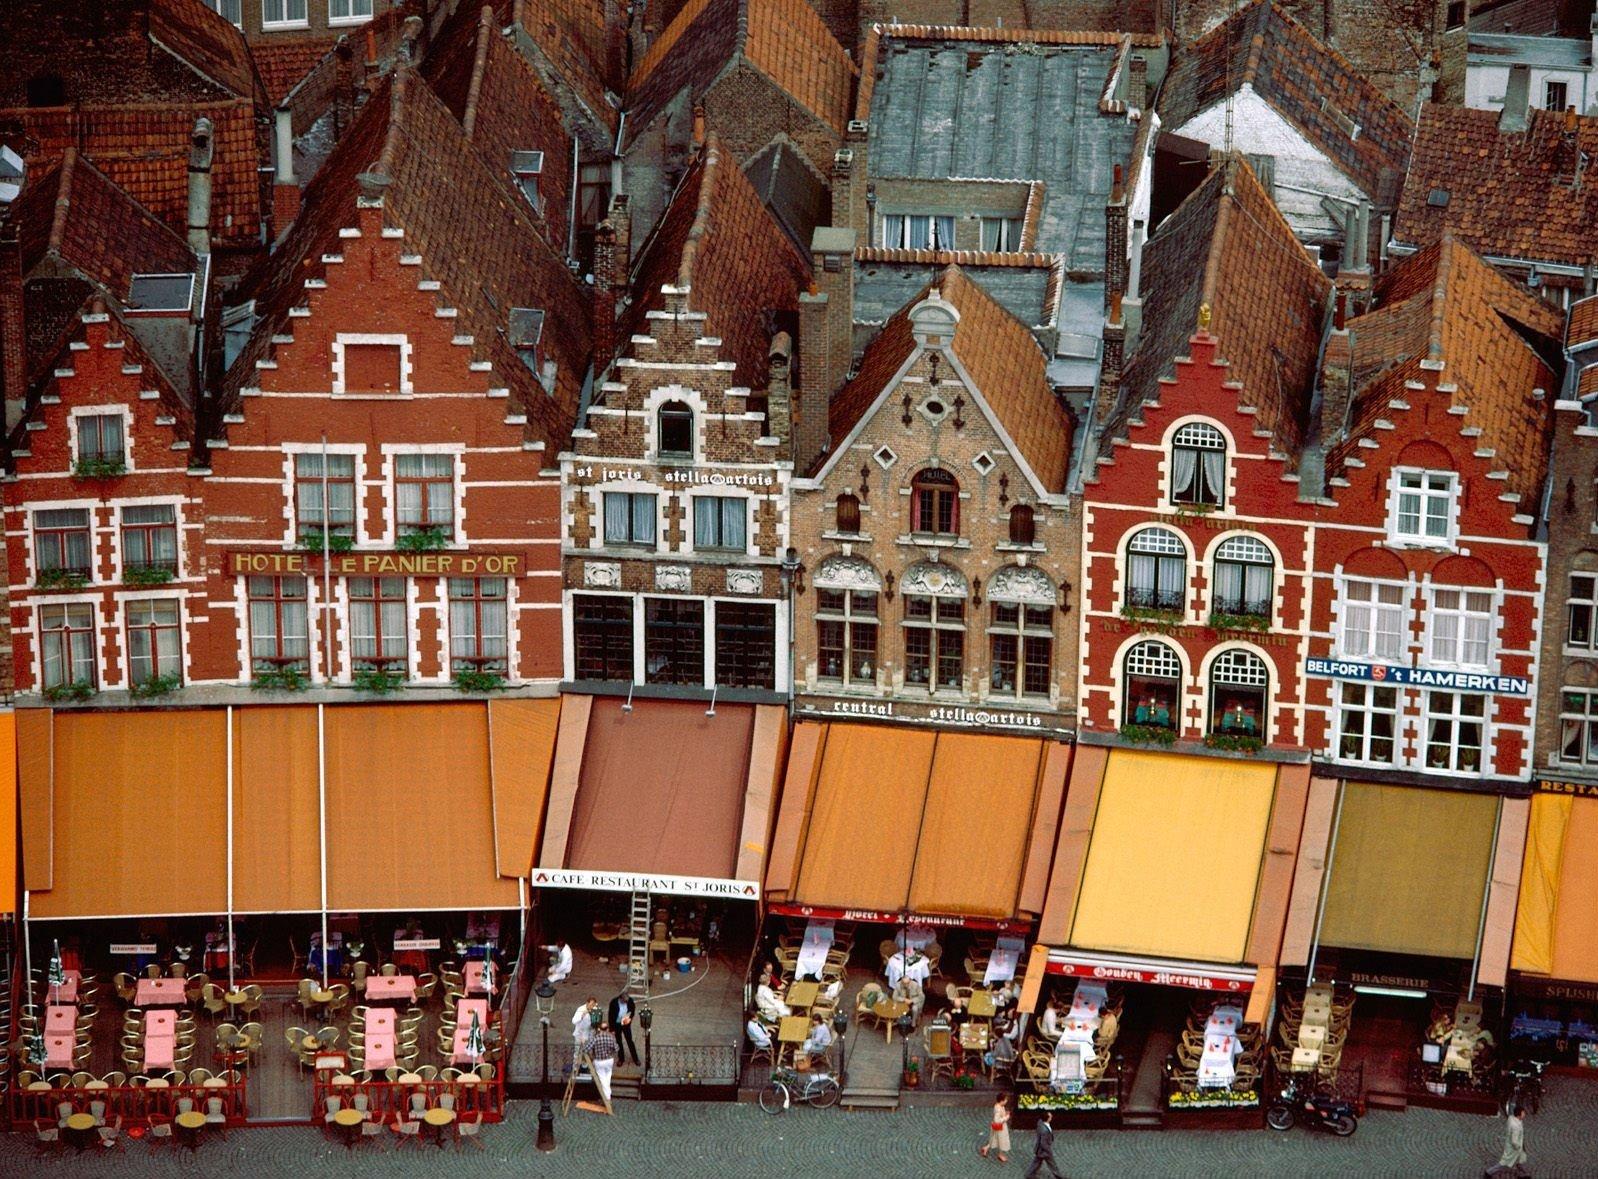 Grote Market Brugge Belgium Fondo De Pantalla And Fondo De